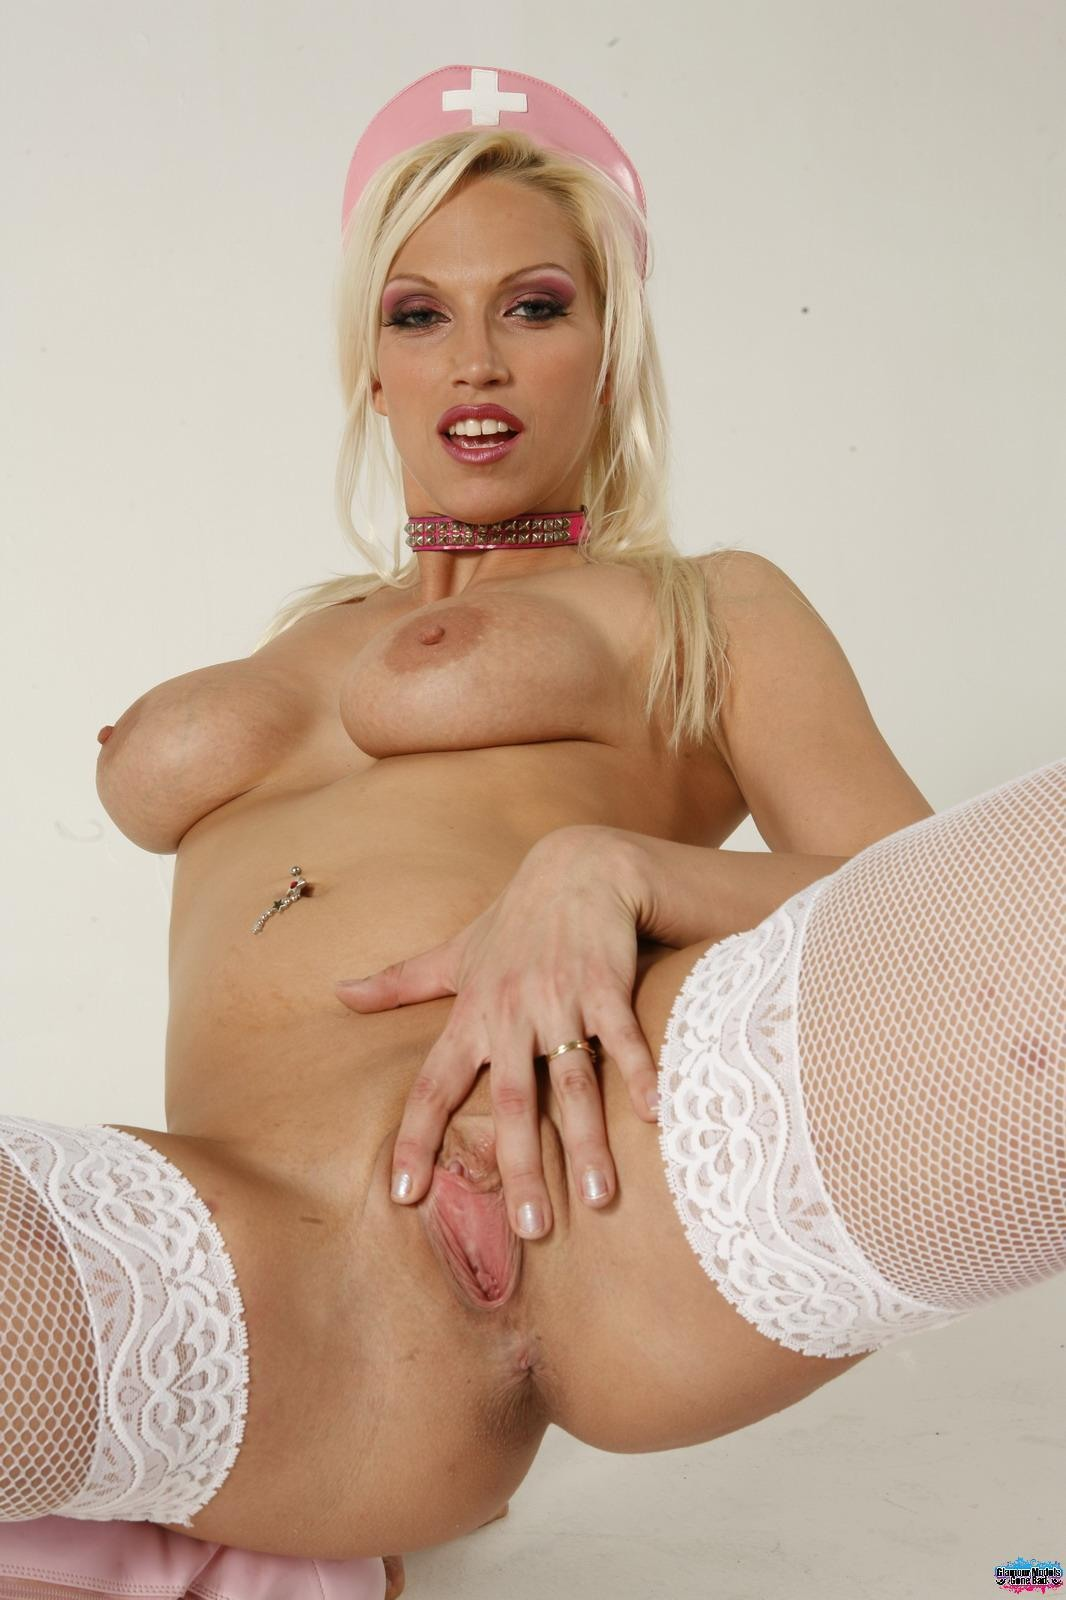 A blond sexy nurse